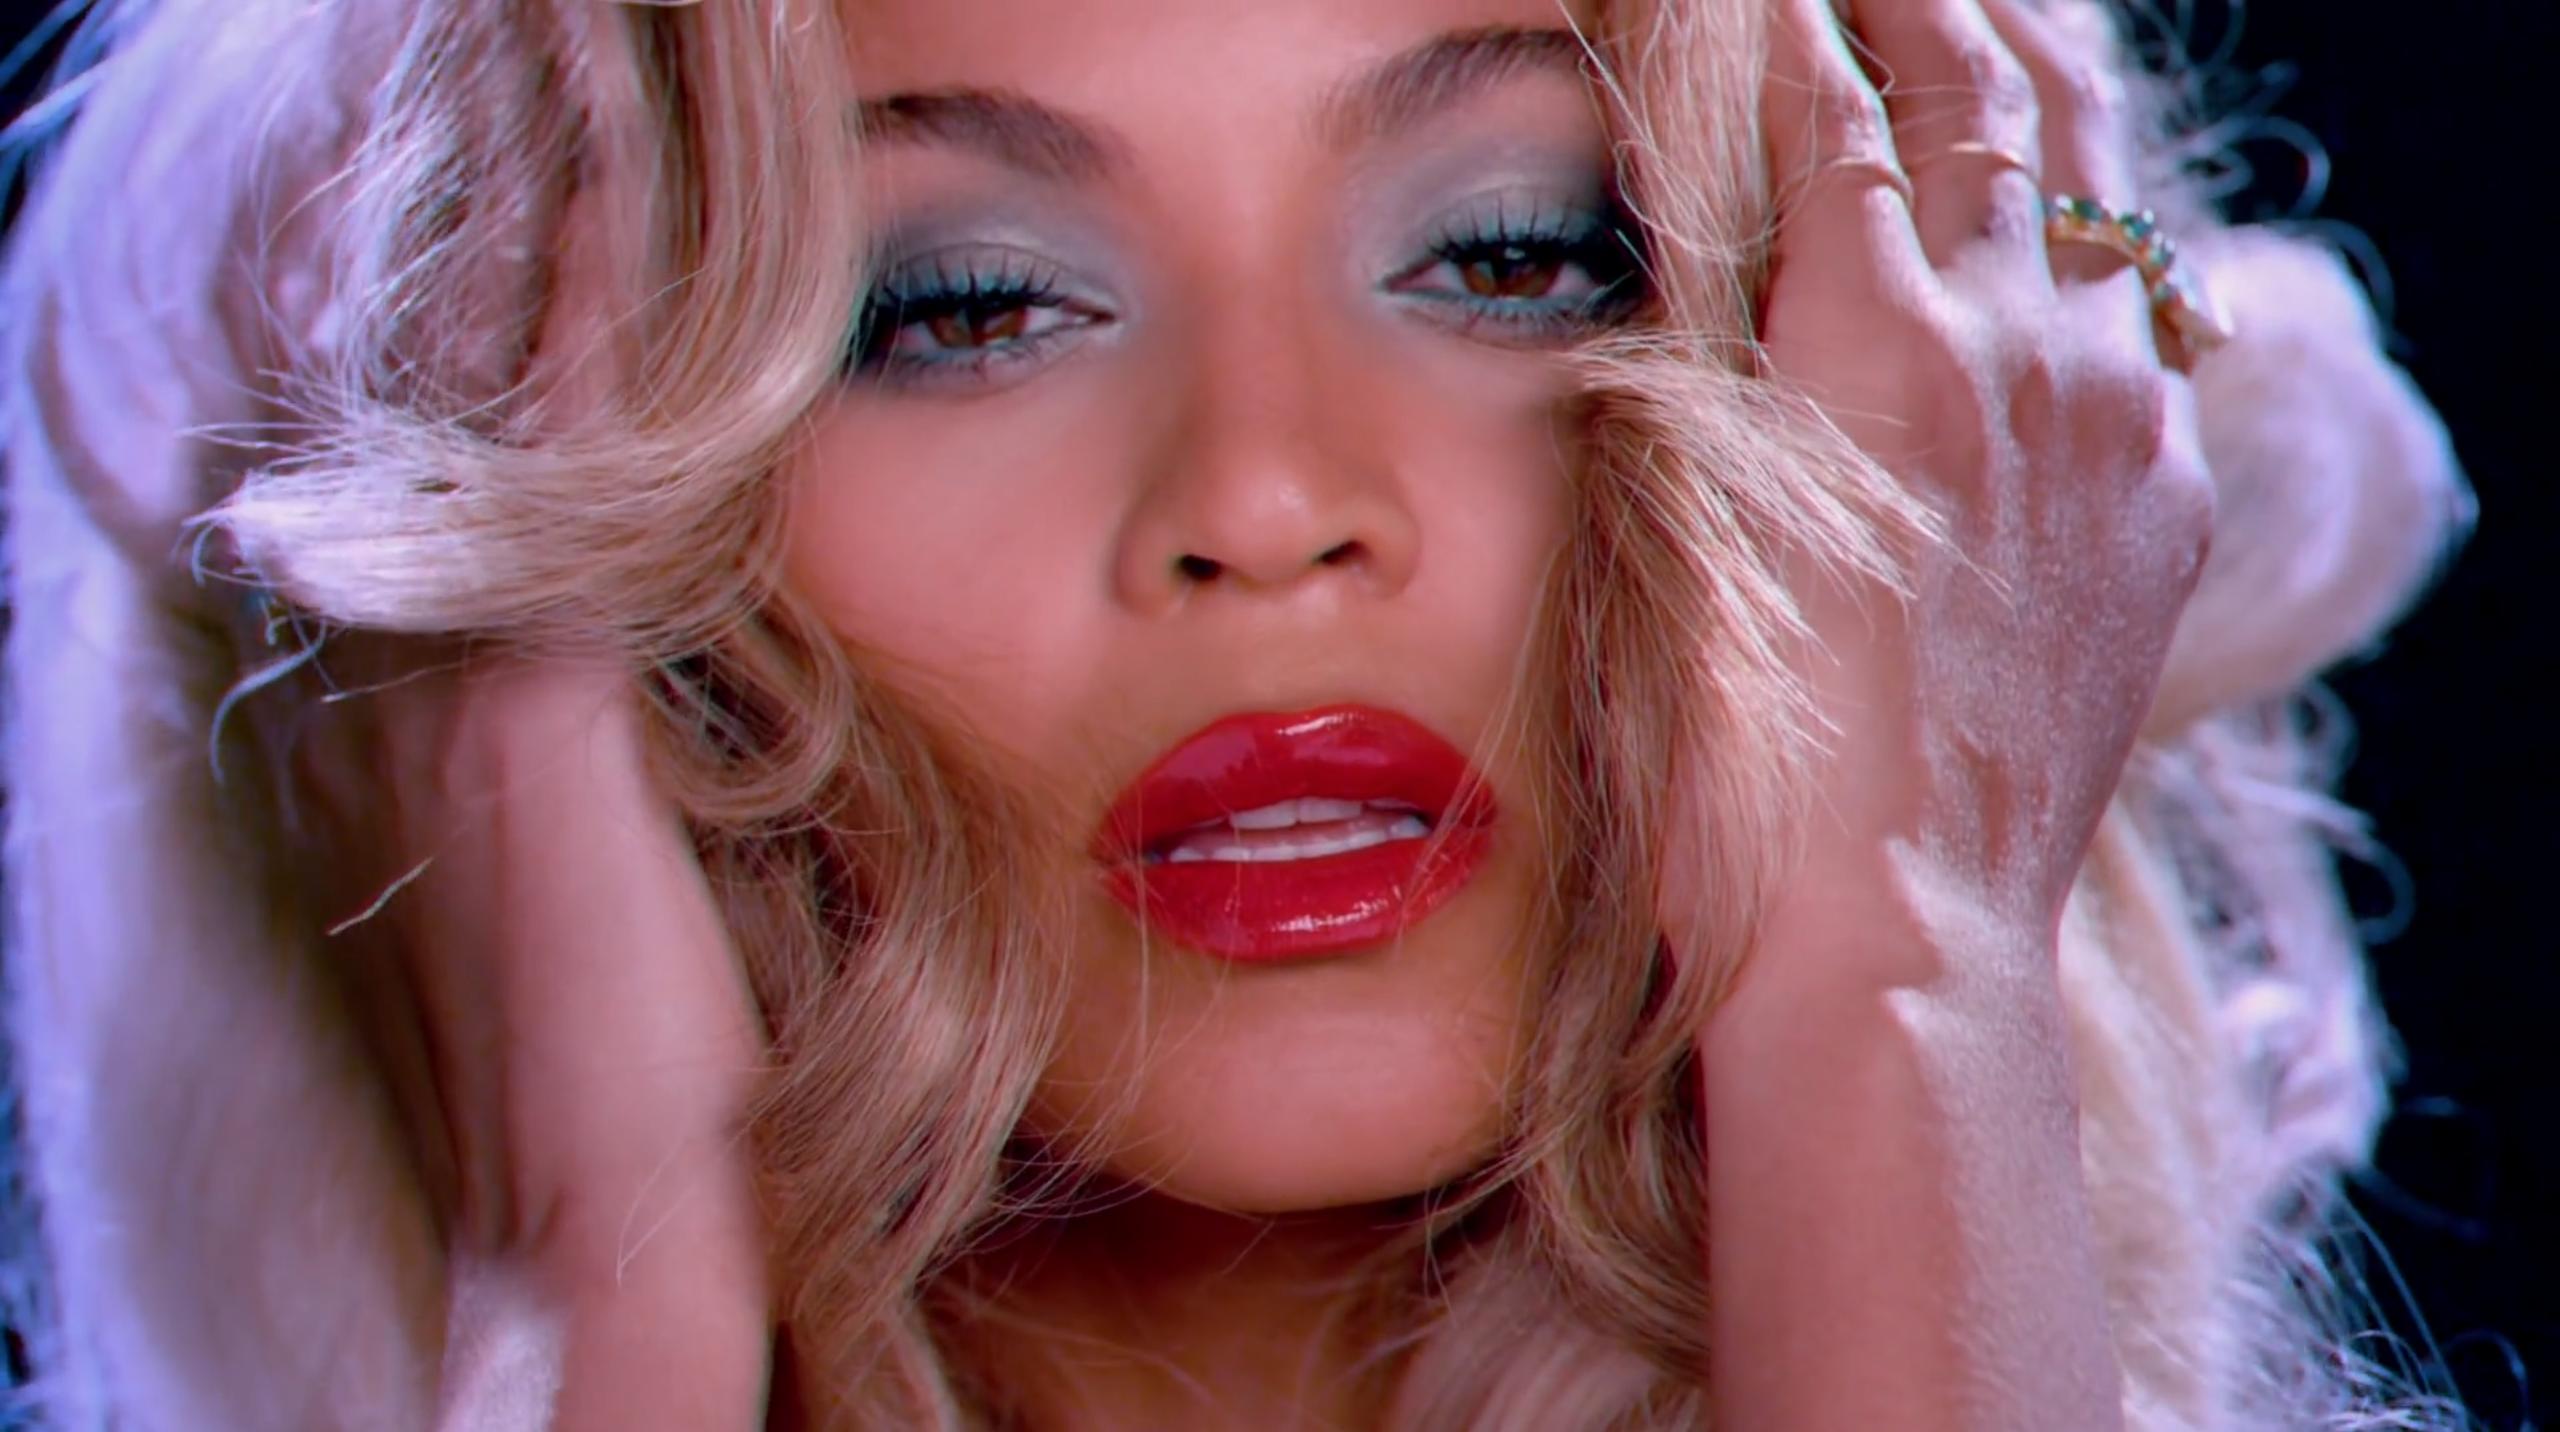 Beyonce lips xxx, wild woman orgasm gif